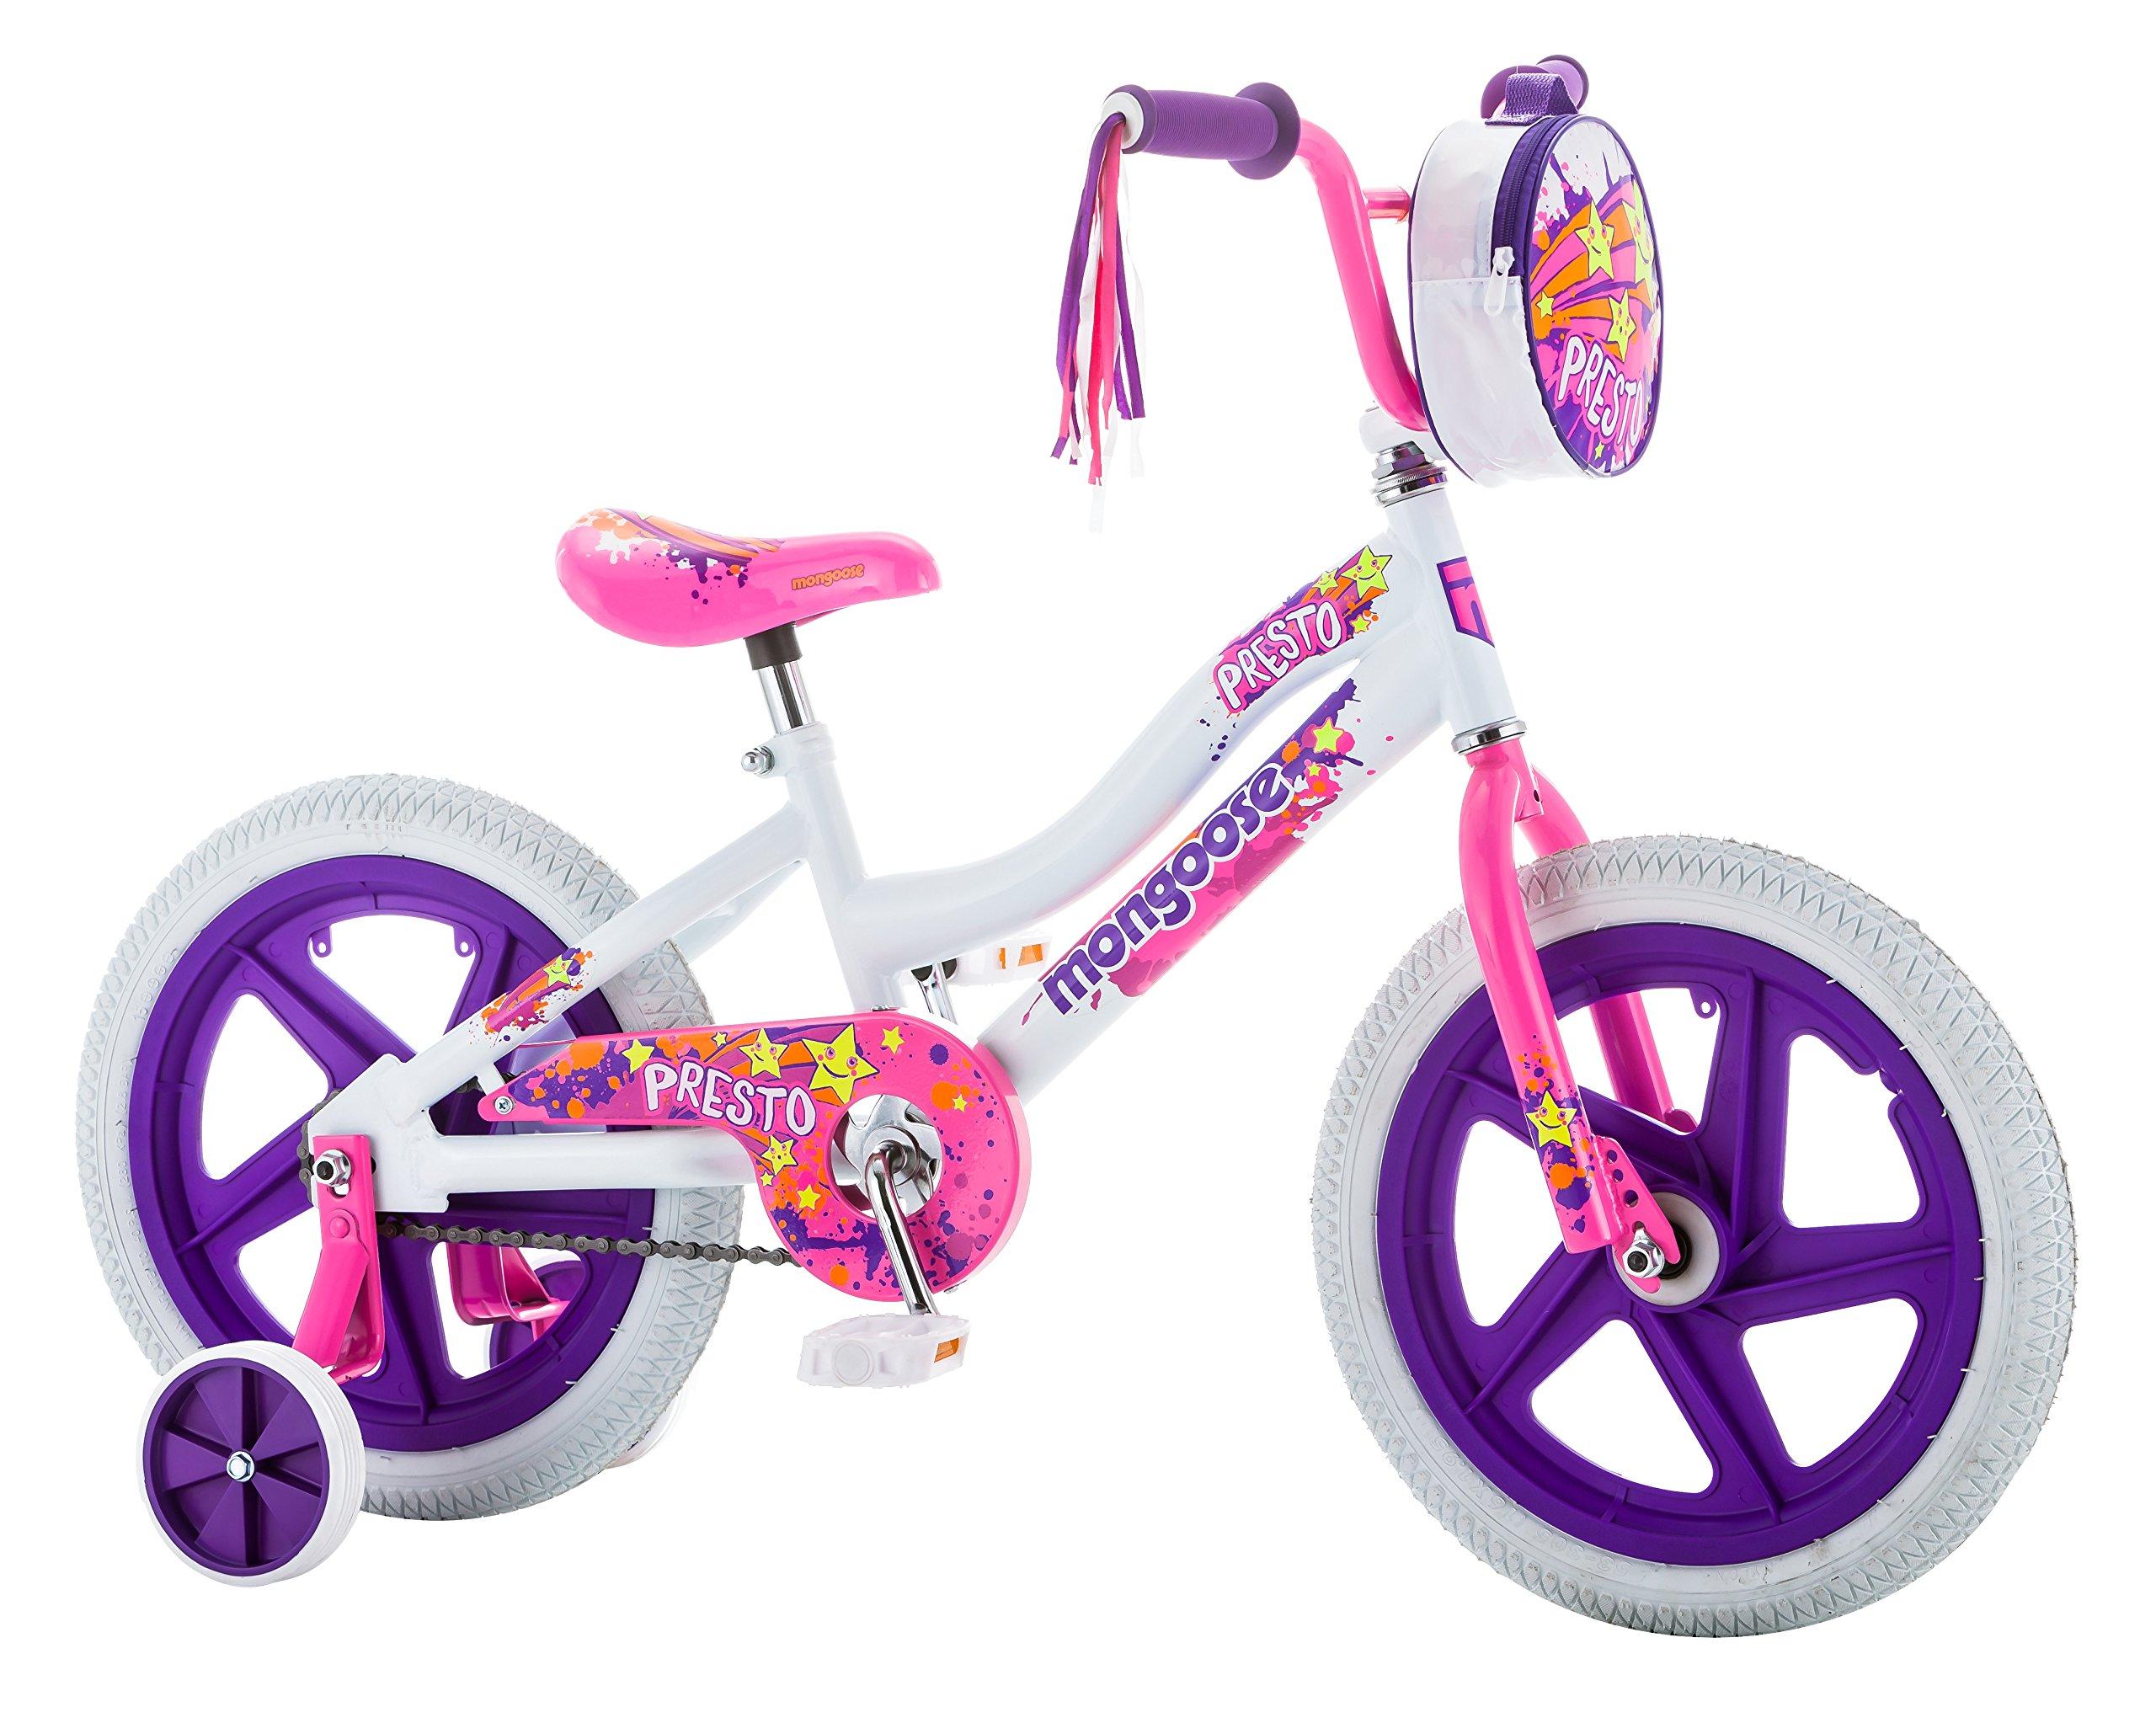 Mongoose Girls Presto Bicycle with 16'' Wheels, White